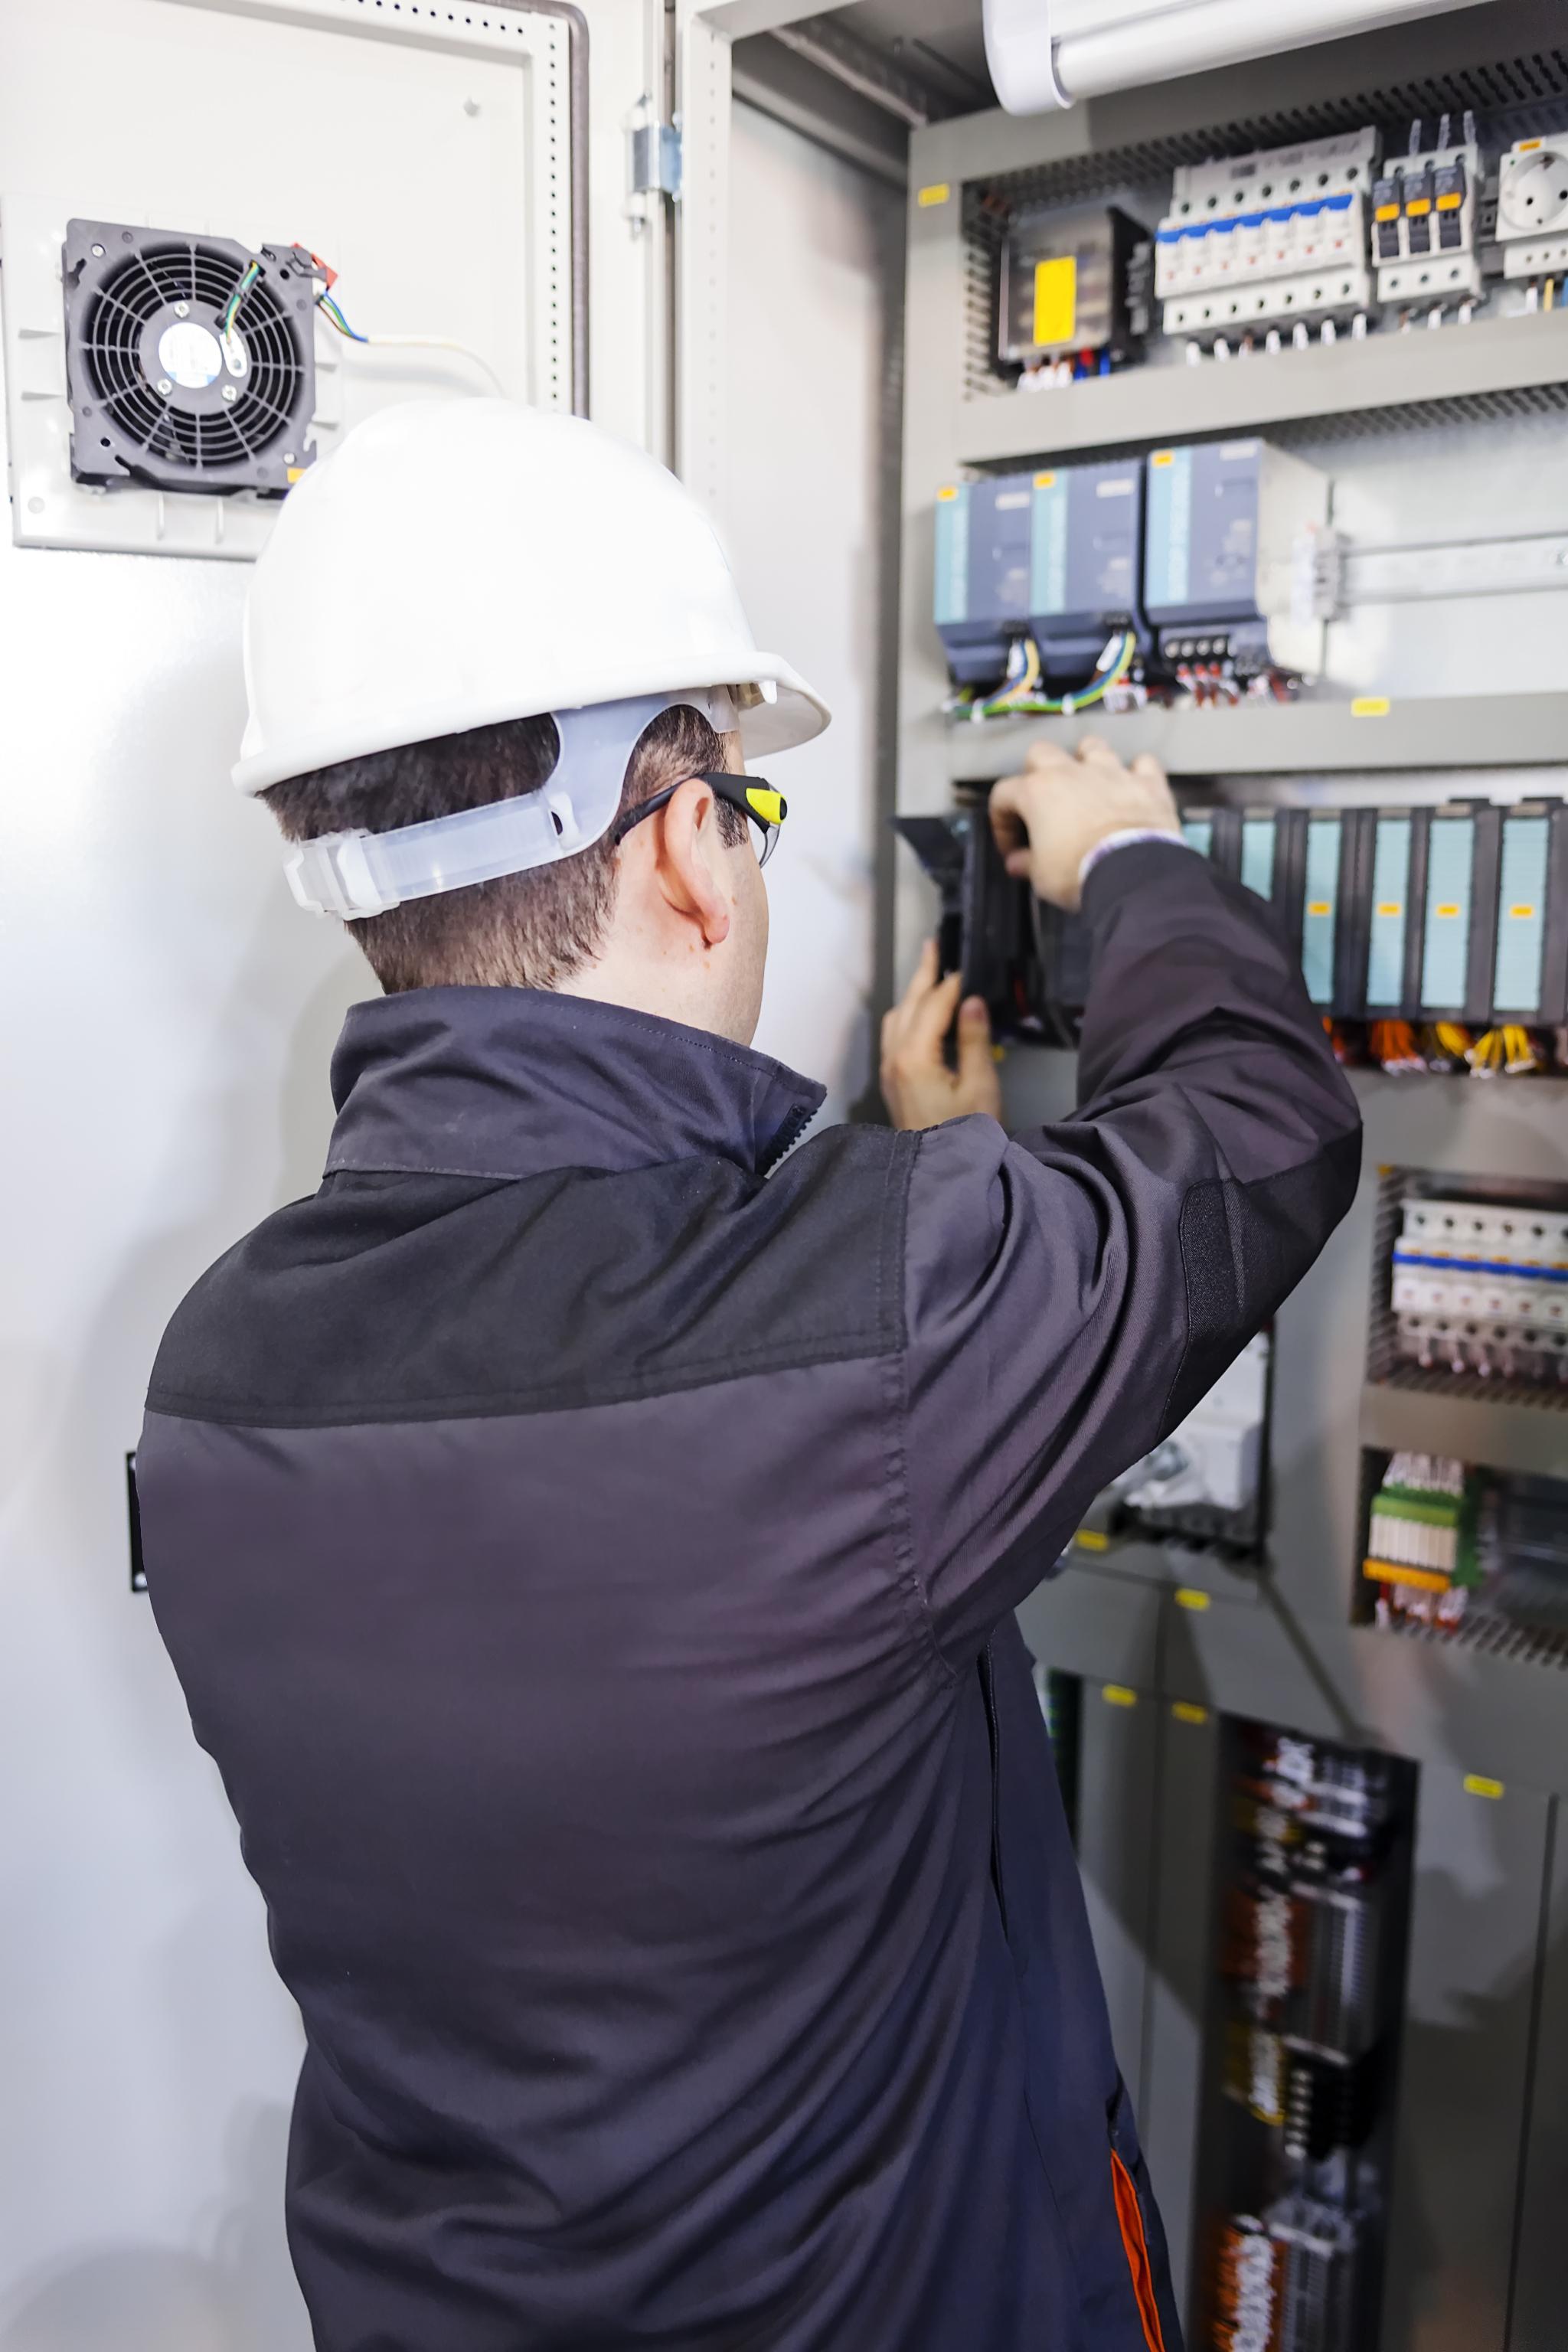 oilandgas_control_systems.jpg